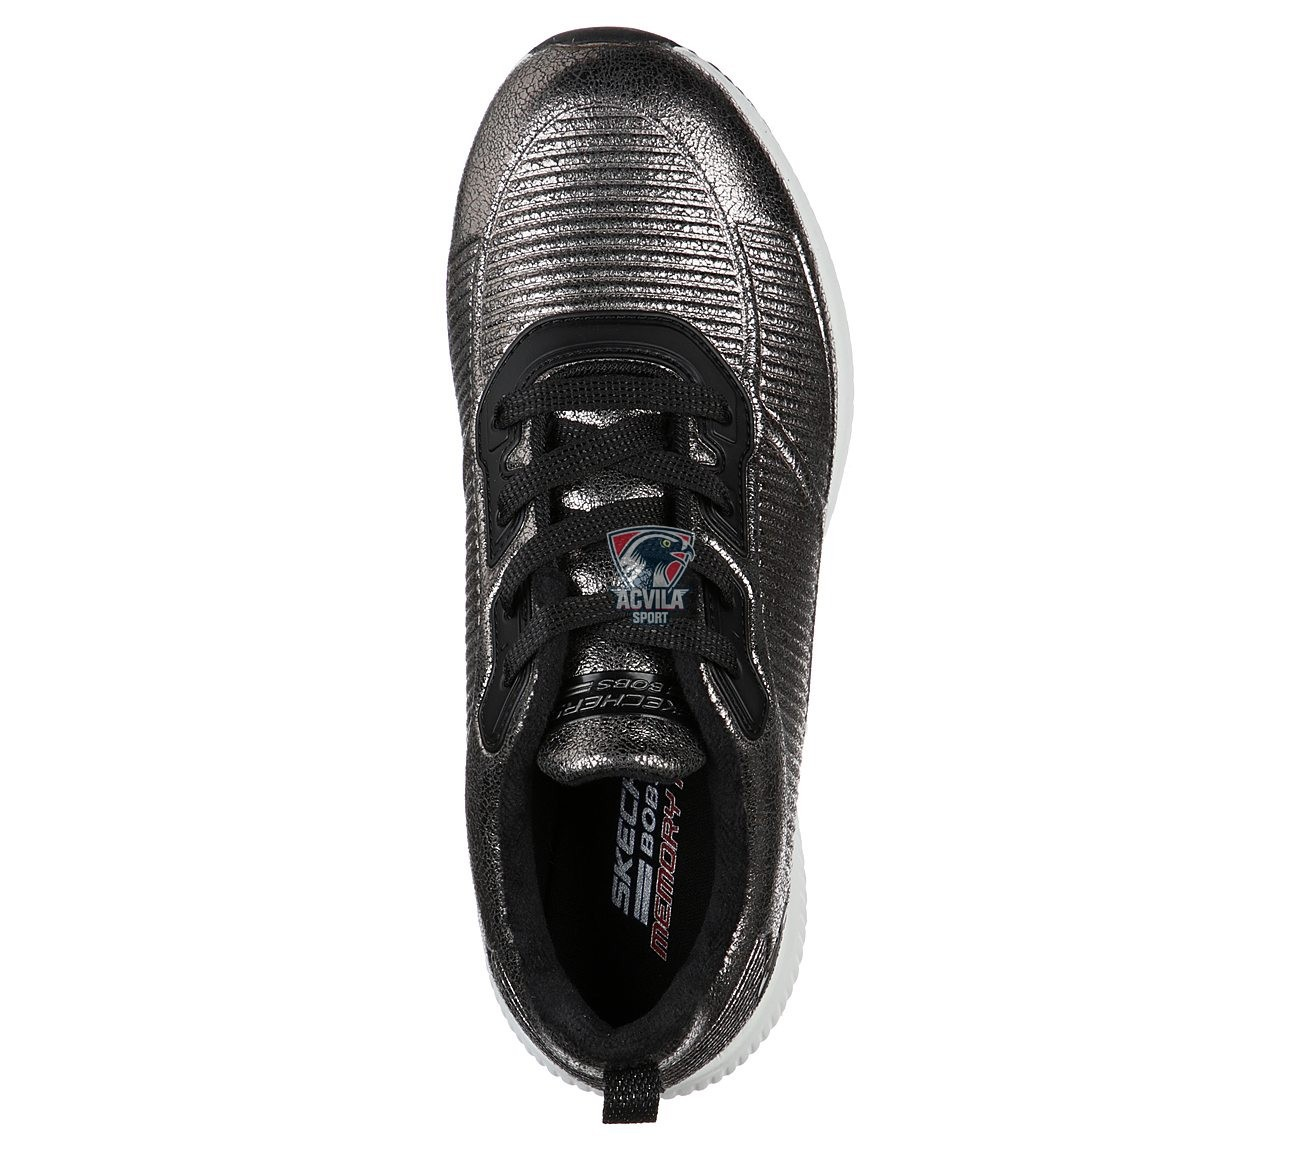 photo 1 Спортивная обувь SKECHERS BOBS SQUAD SPARKLE